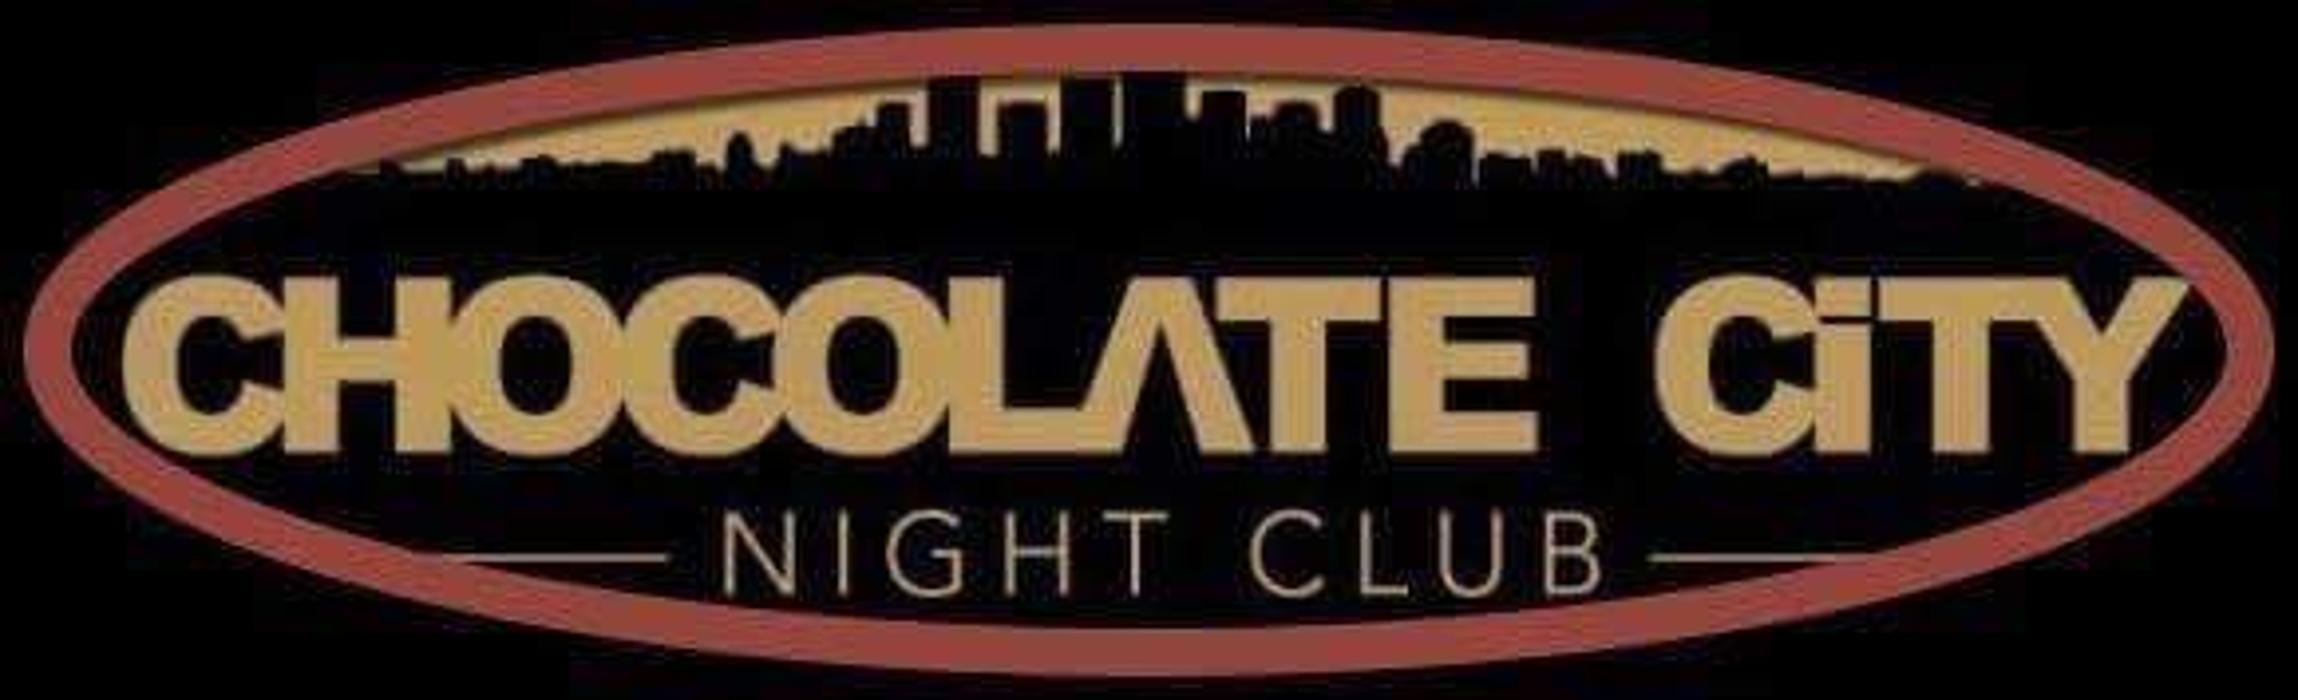 Bild zu Chocolate City night club in Düsseldorf